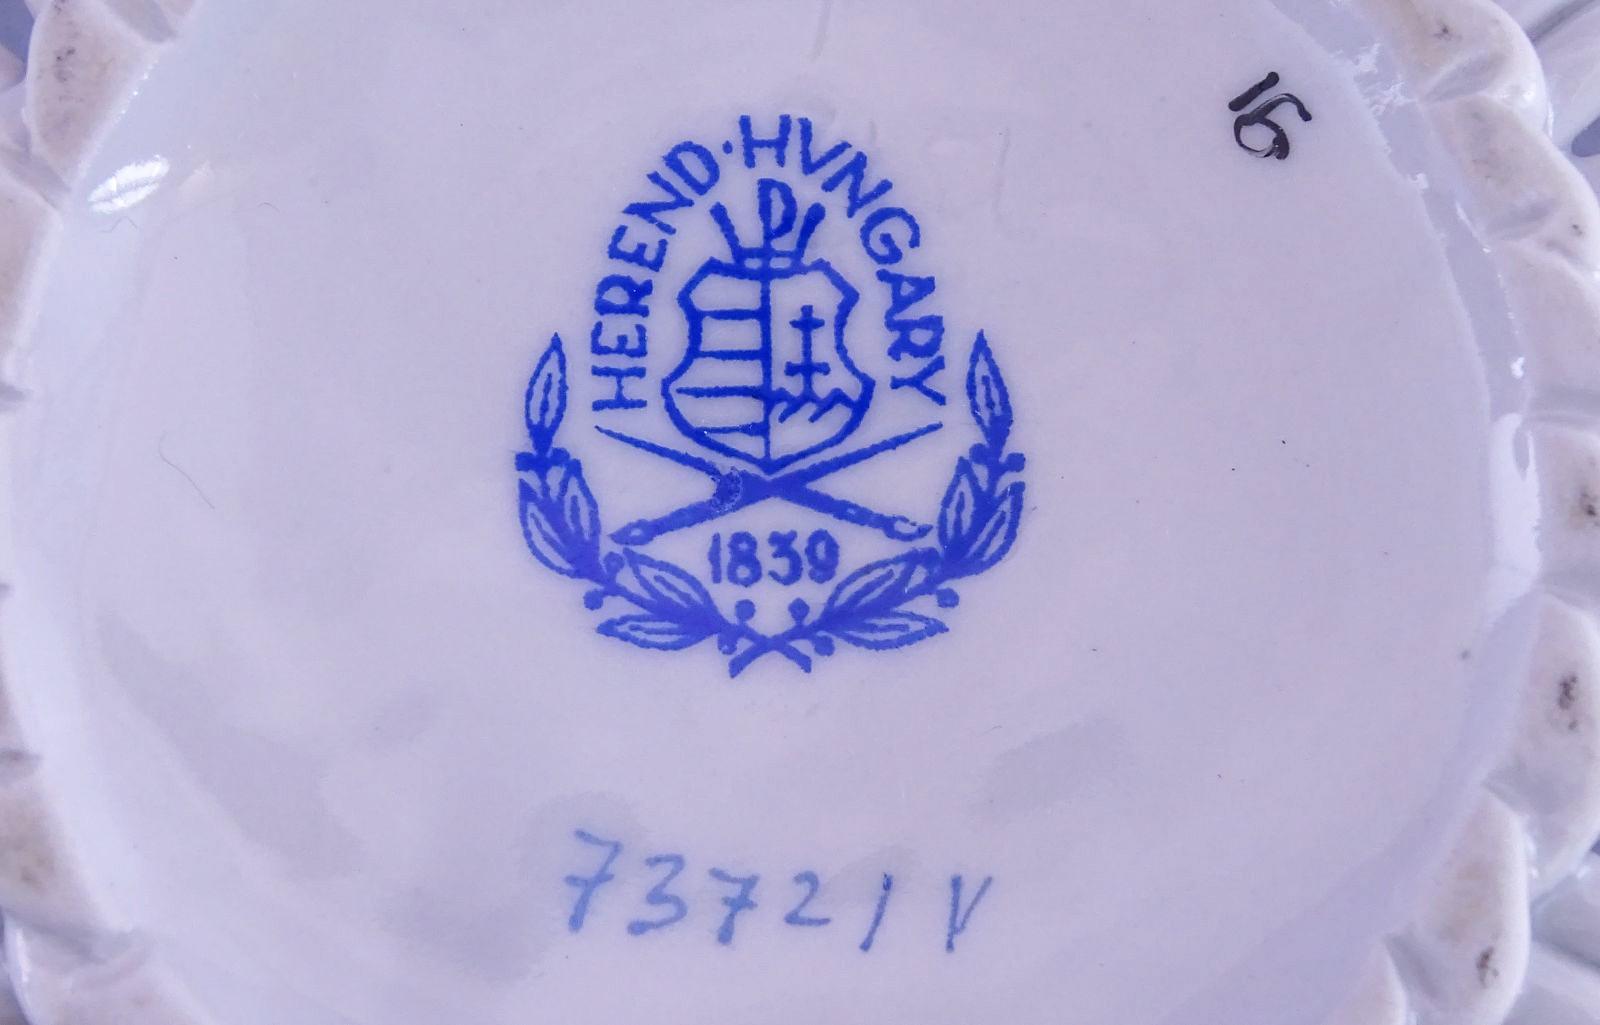 DSC09153.JPG (1600�1025)